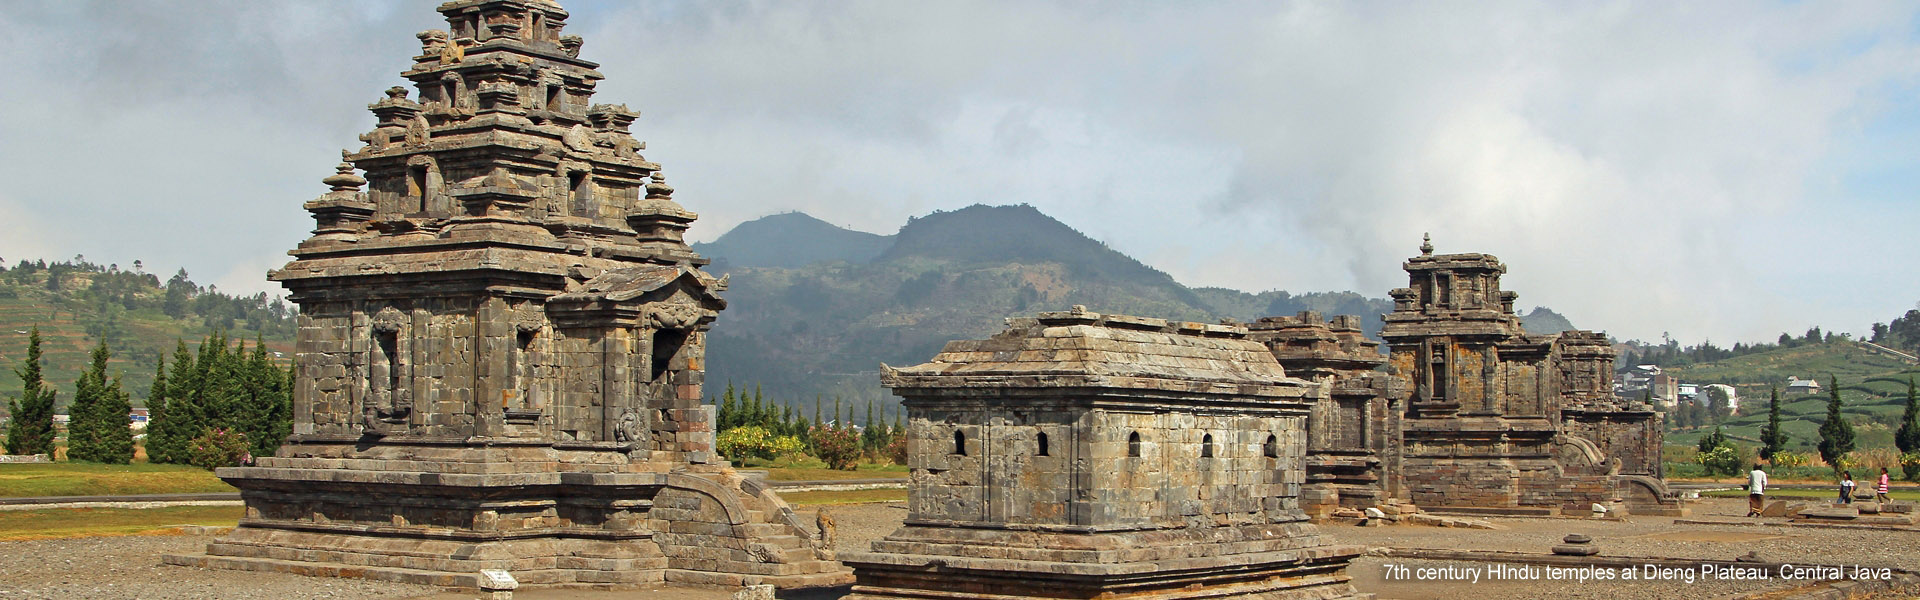 Dieng Plateau Java Indonesia Tour Plateu Ancient Hindu Temples At Central